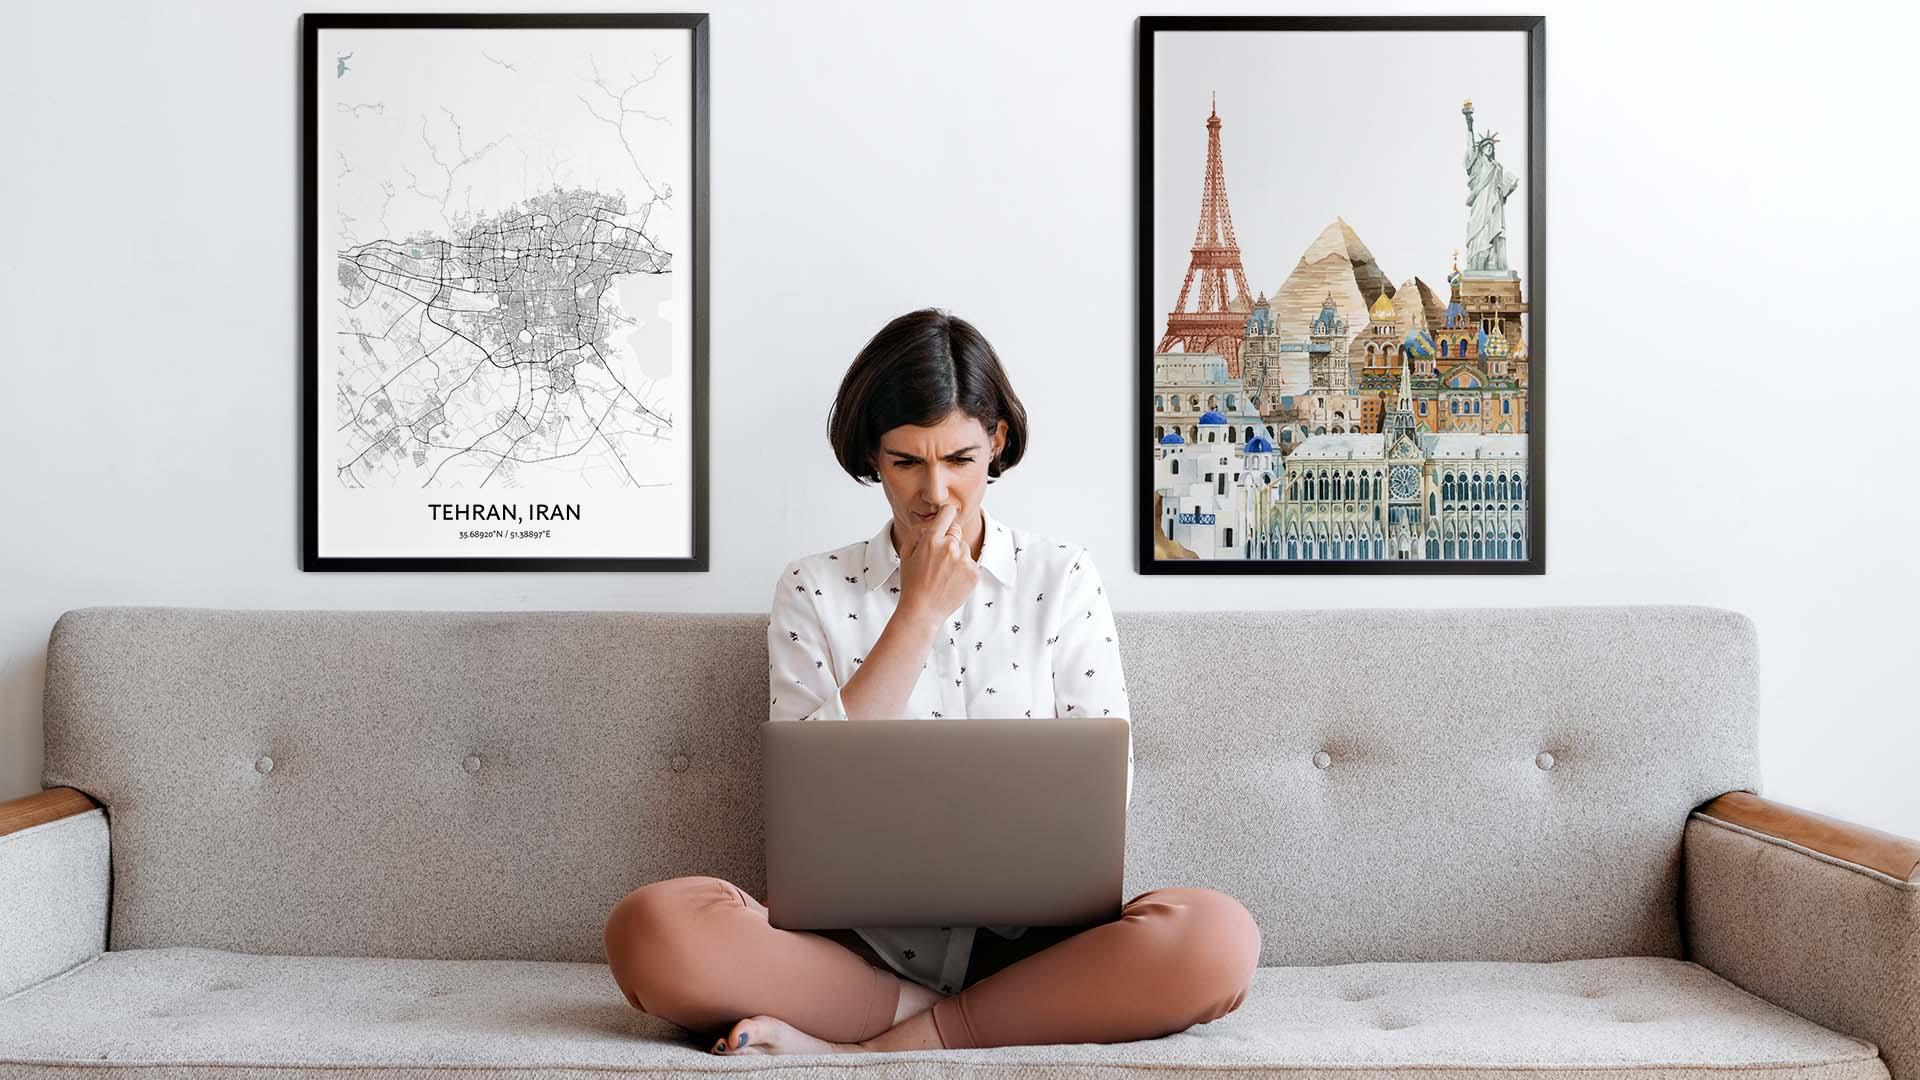 Tehran city map art